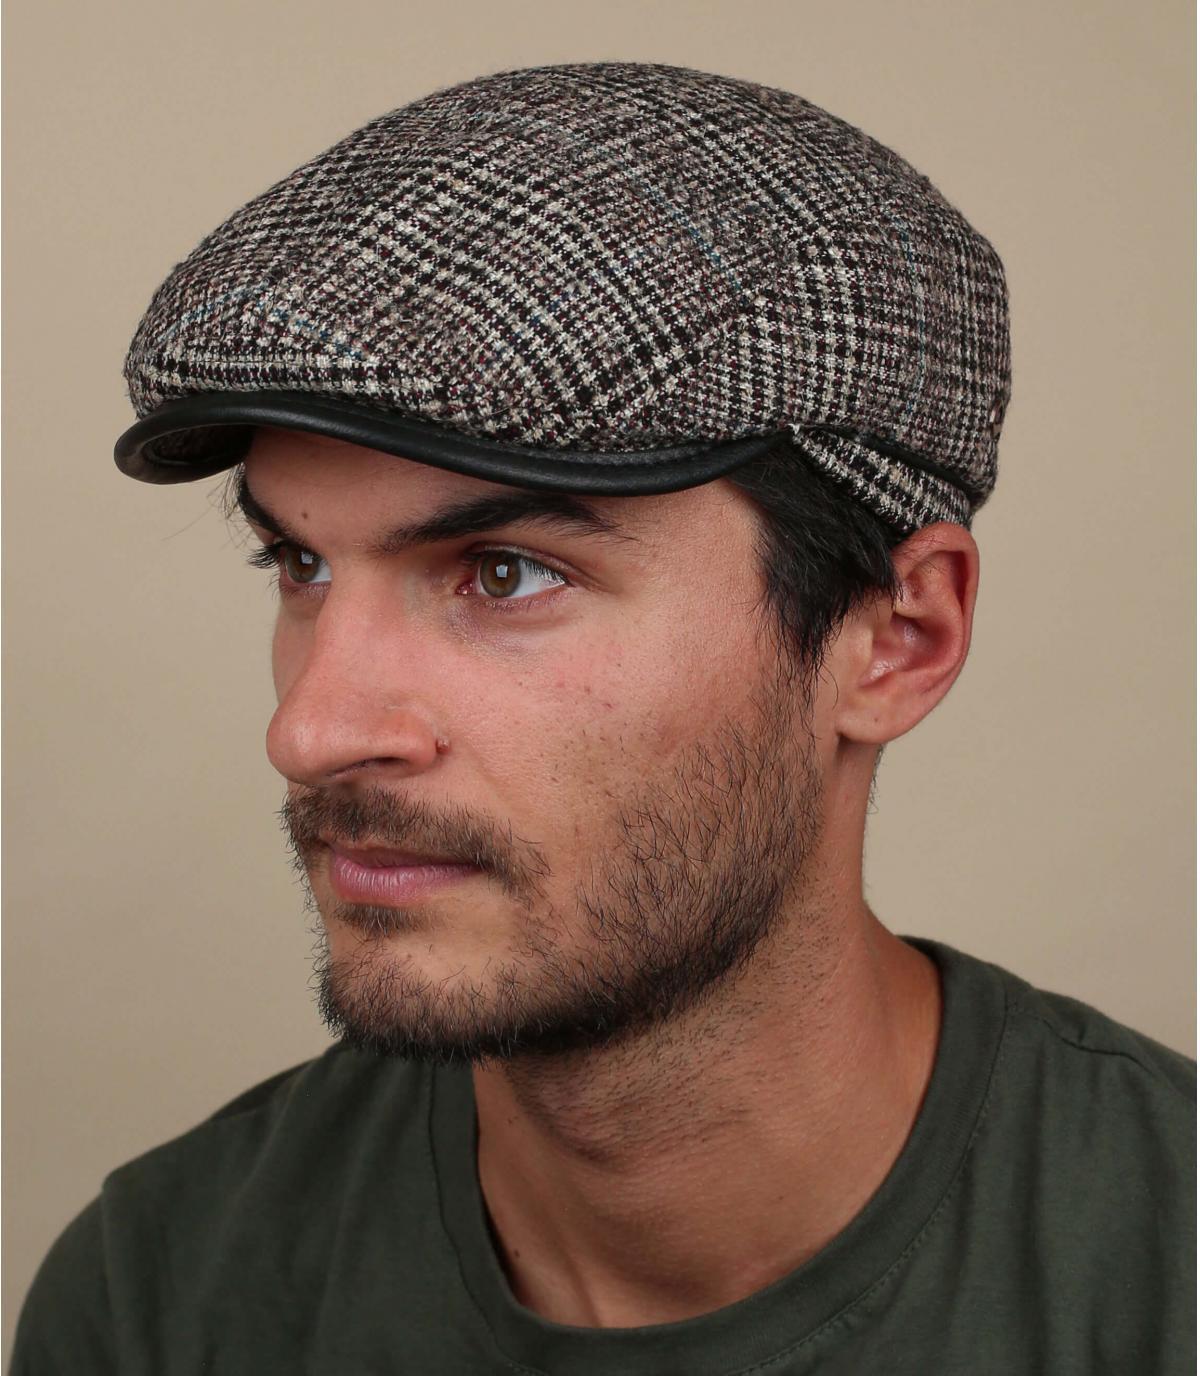 berretto di lana a quadri beige